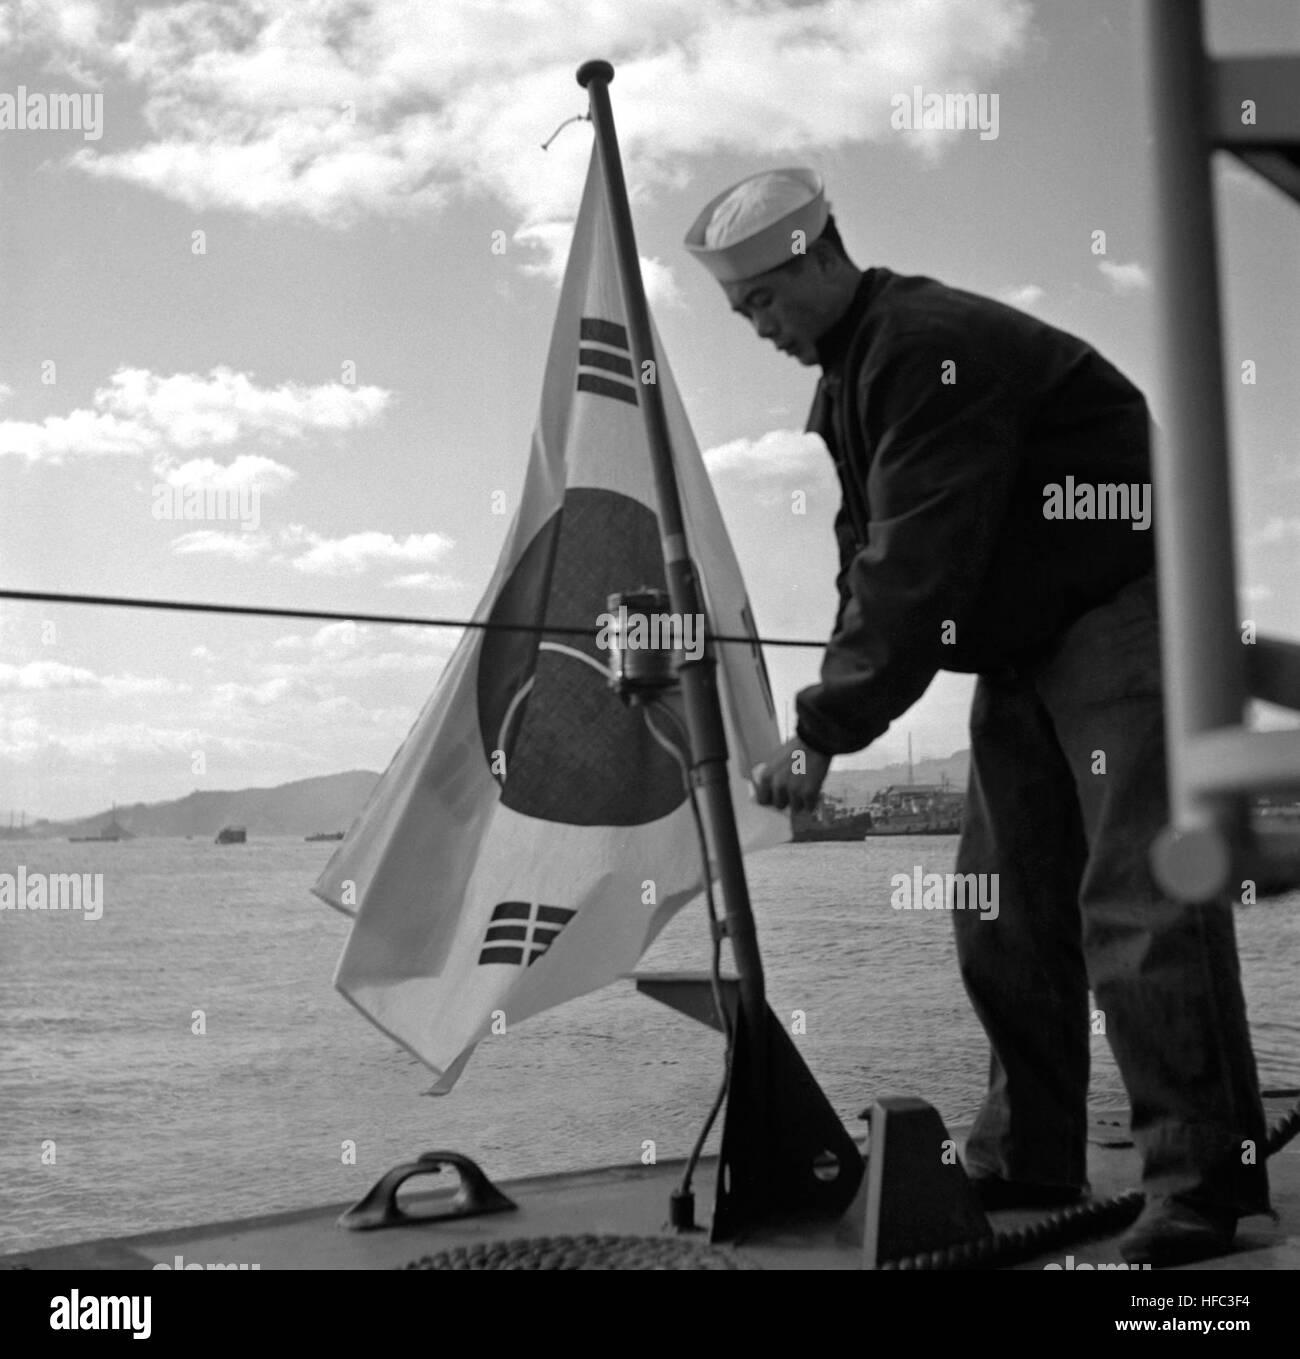 ROK sailor raising Korean flag on stearn of PT boat after transfer from U.S. Navy at Sasebo, Japan. NARA FILE #: Stock Photo